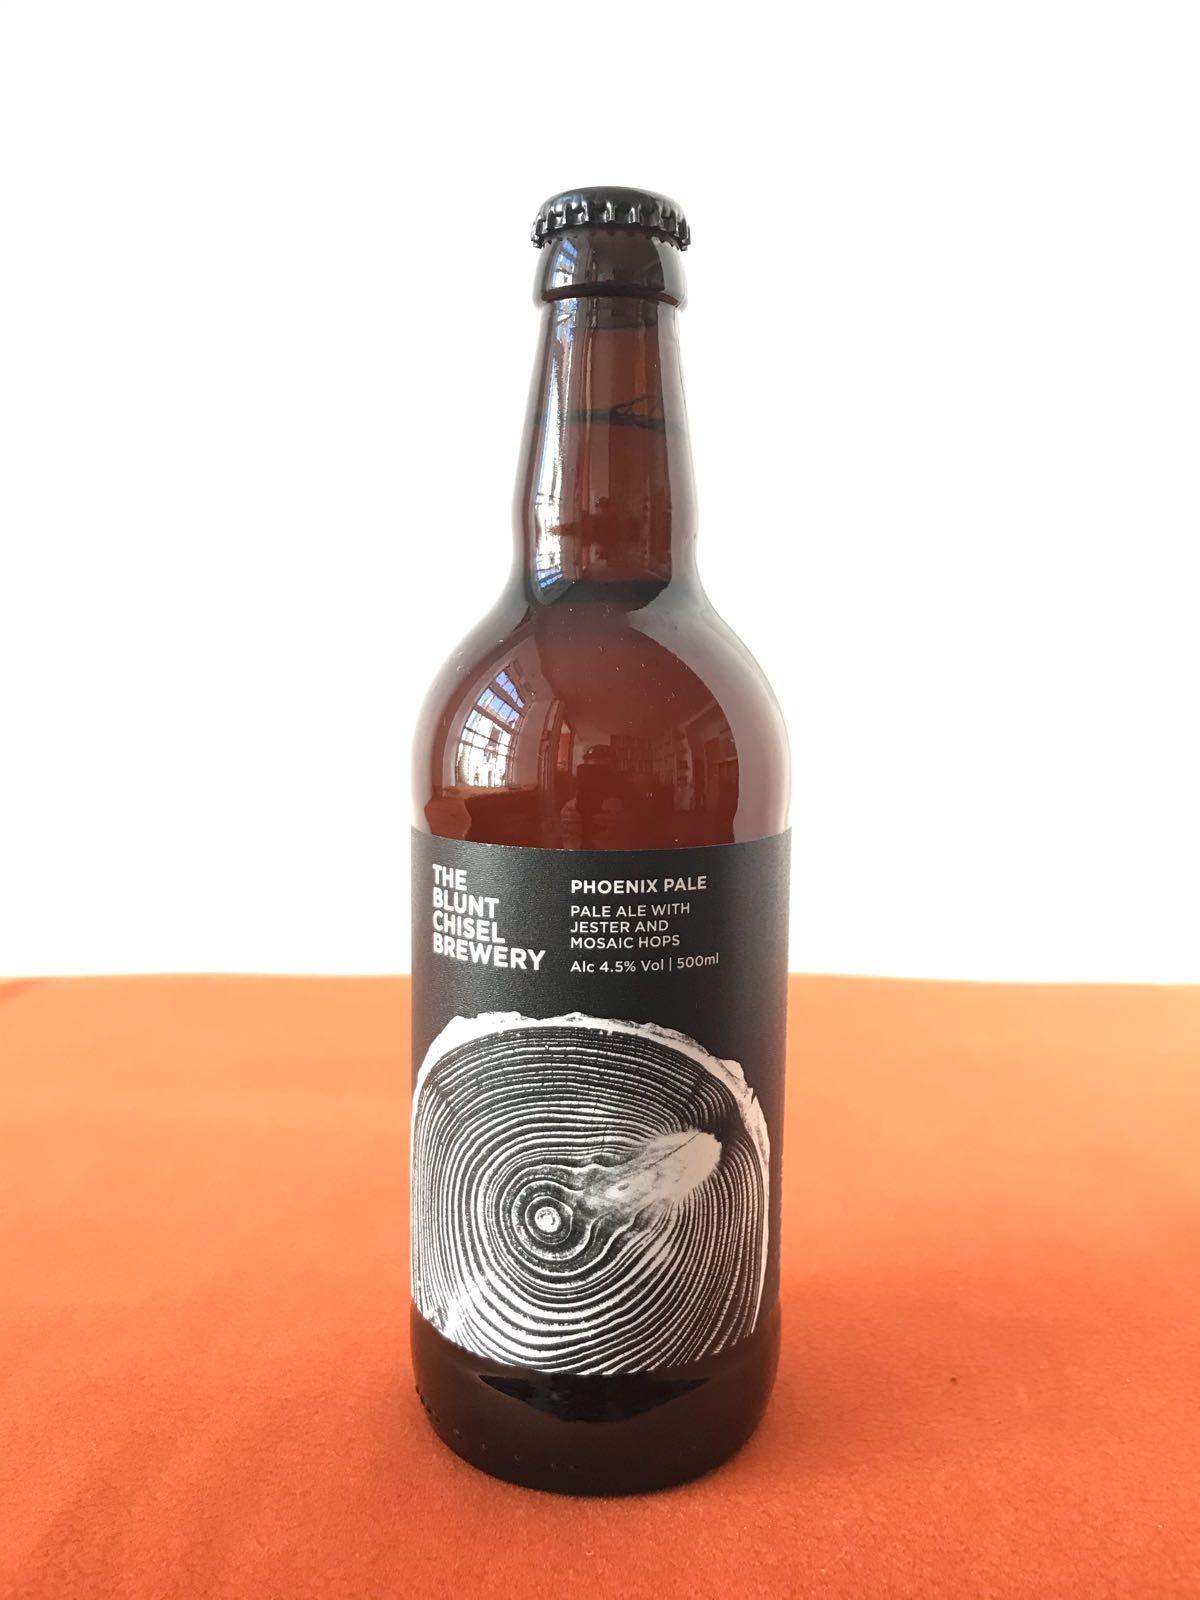 Blunt Chisel Brewery:  Phoenix Pale